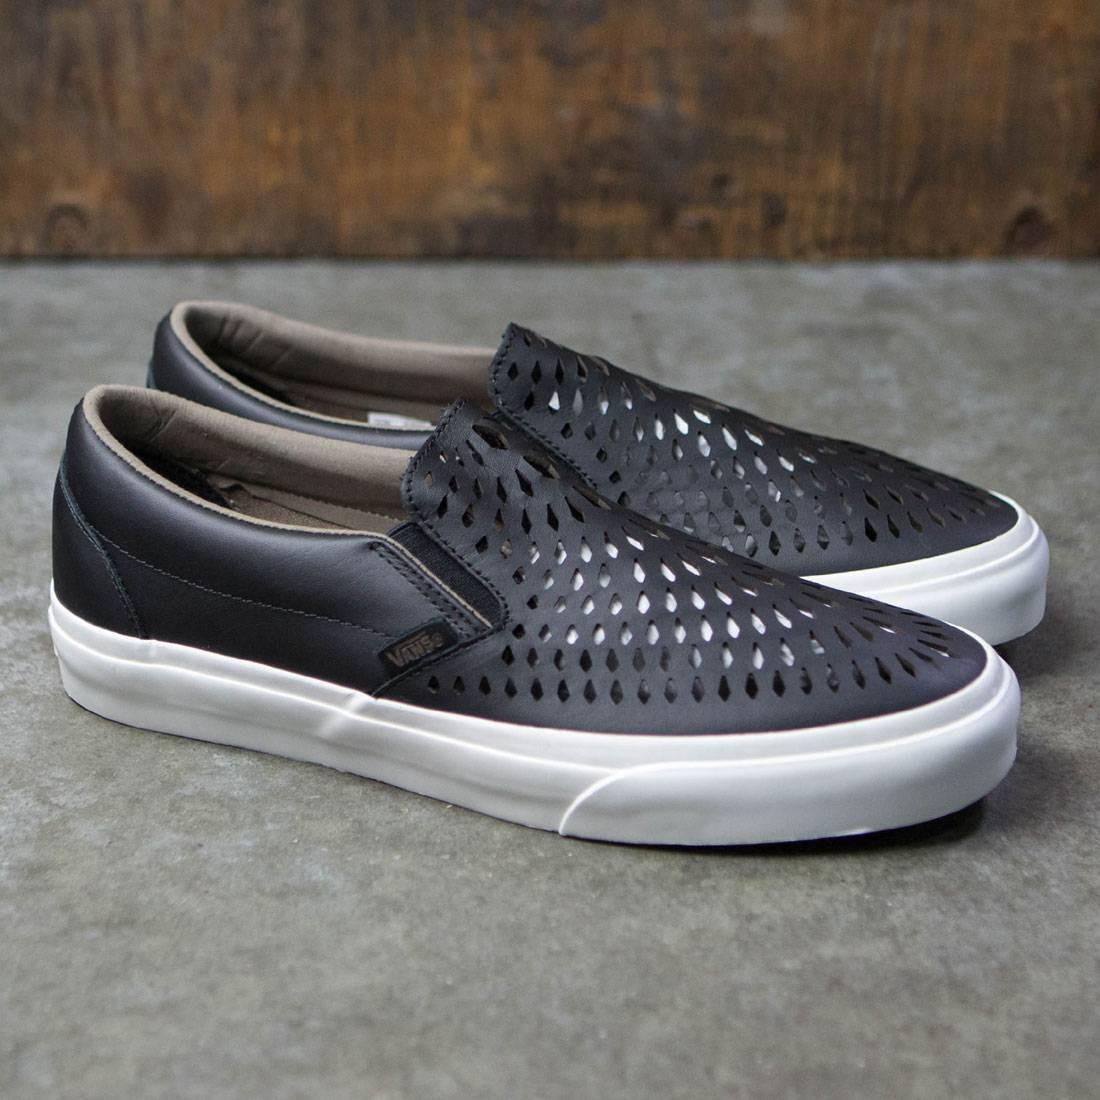 Vans Men Classic Slip-On Dx - Havana Perforated Leather (black) 9031cb77c